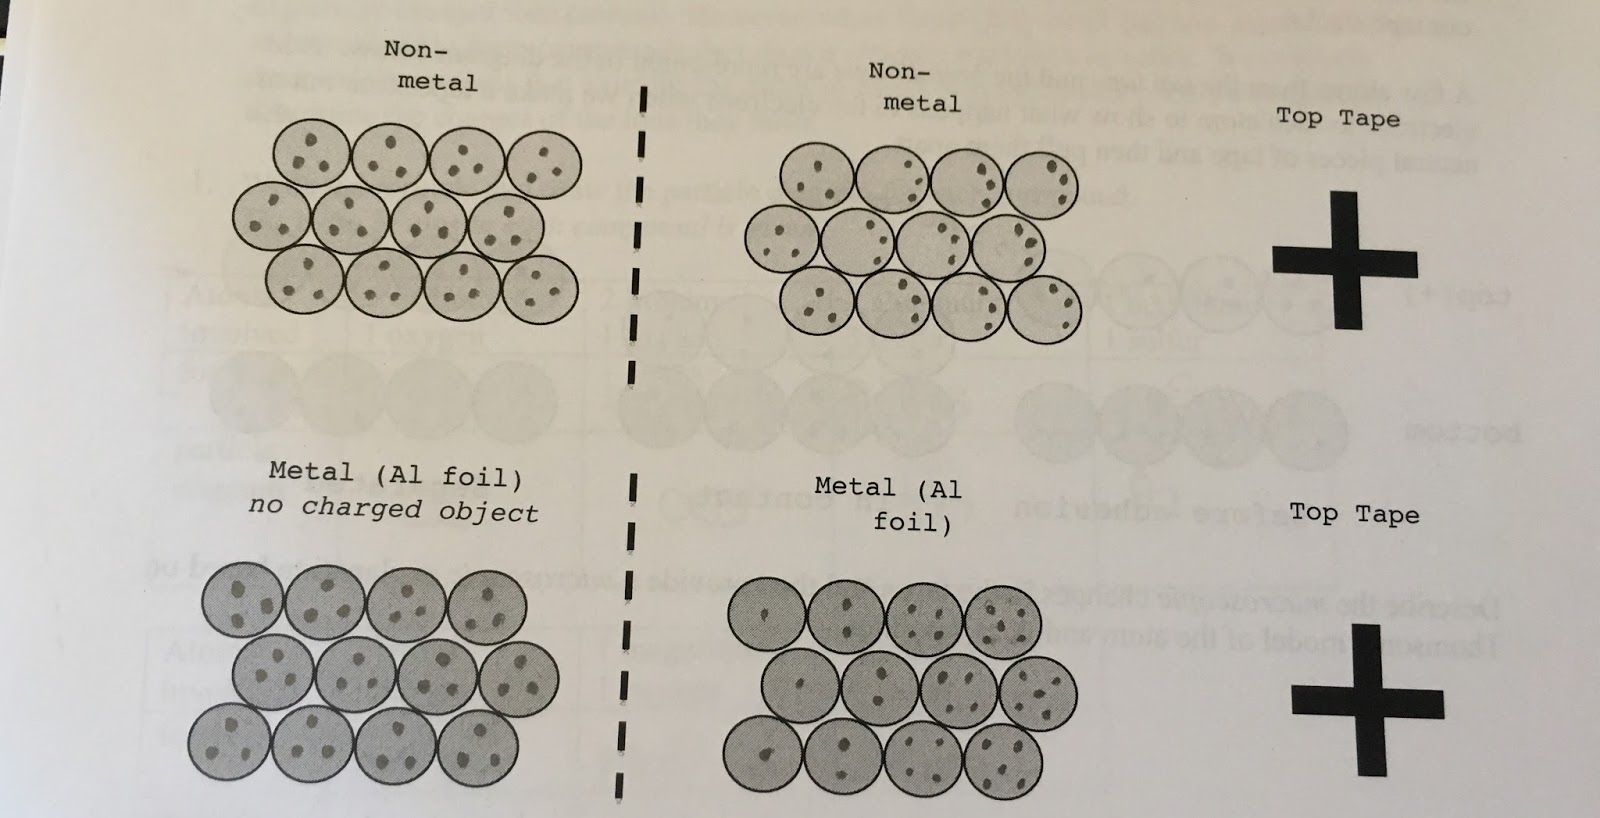 Sg Chem 2 Reflection Sg Chem2 Week 6